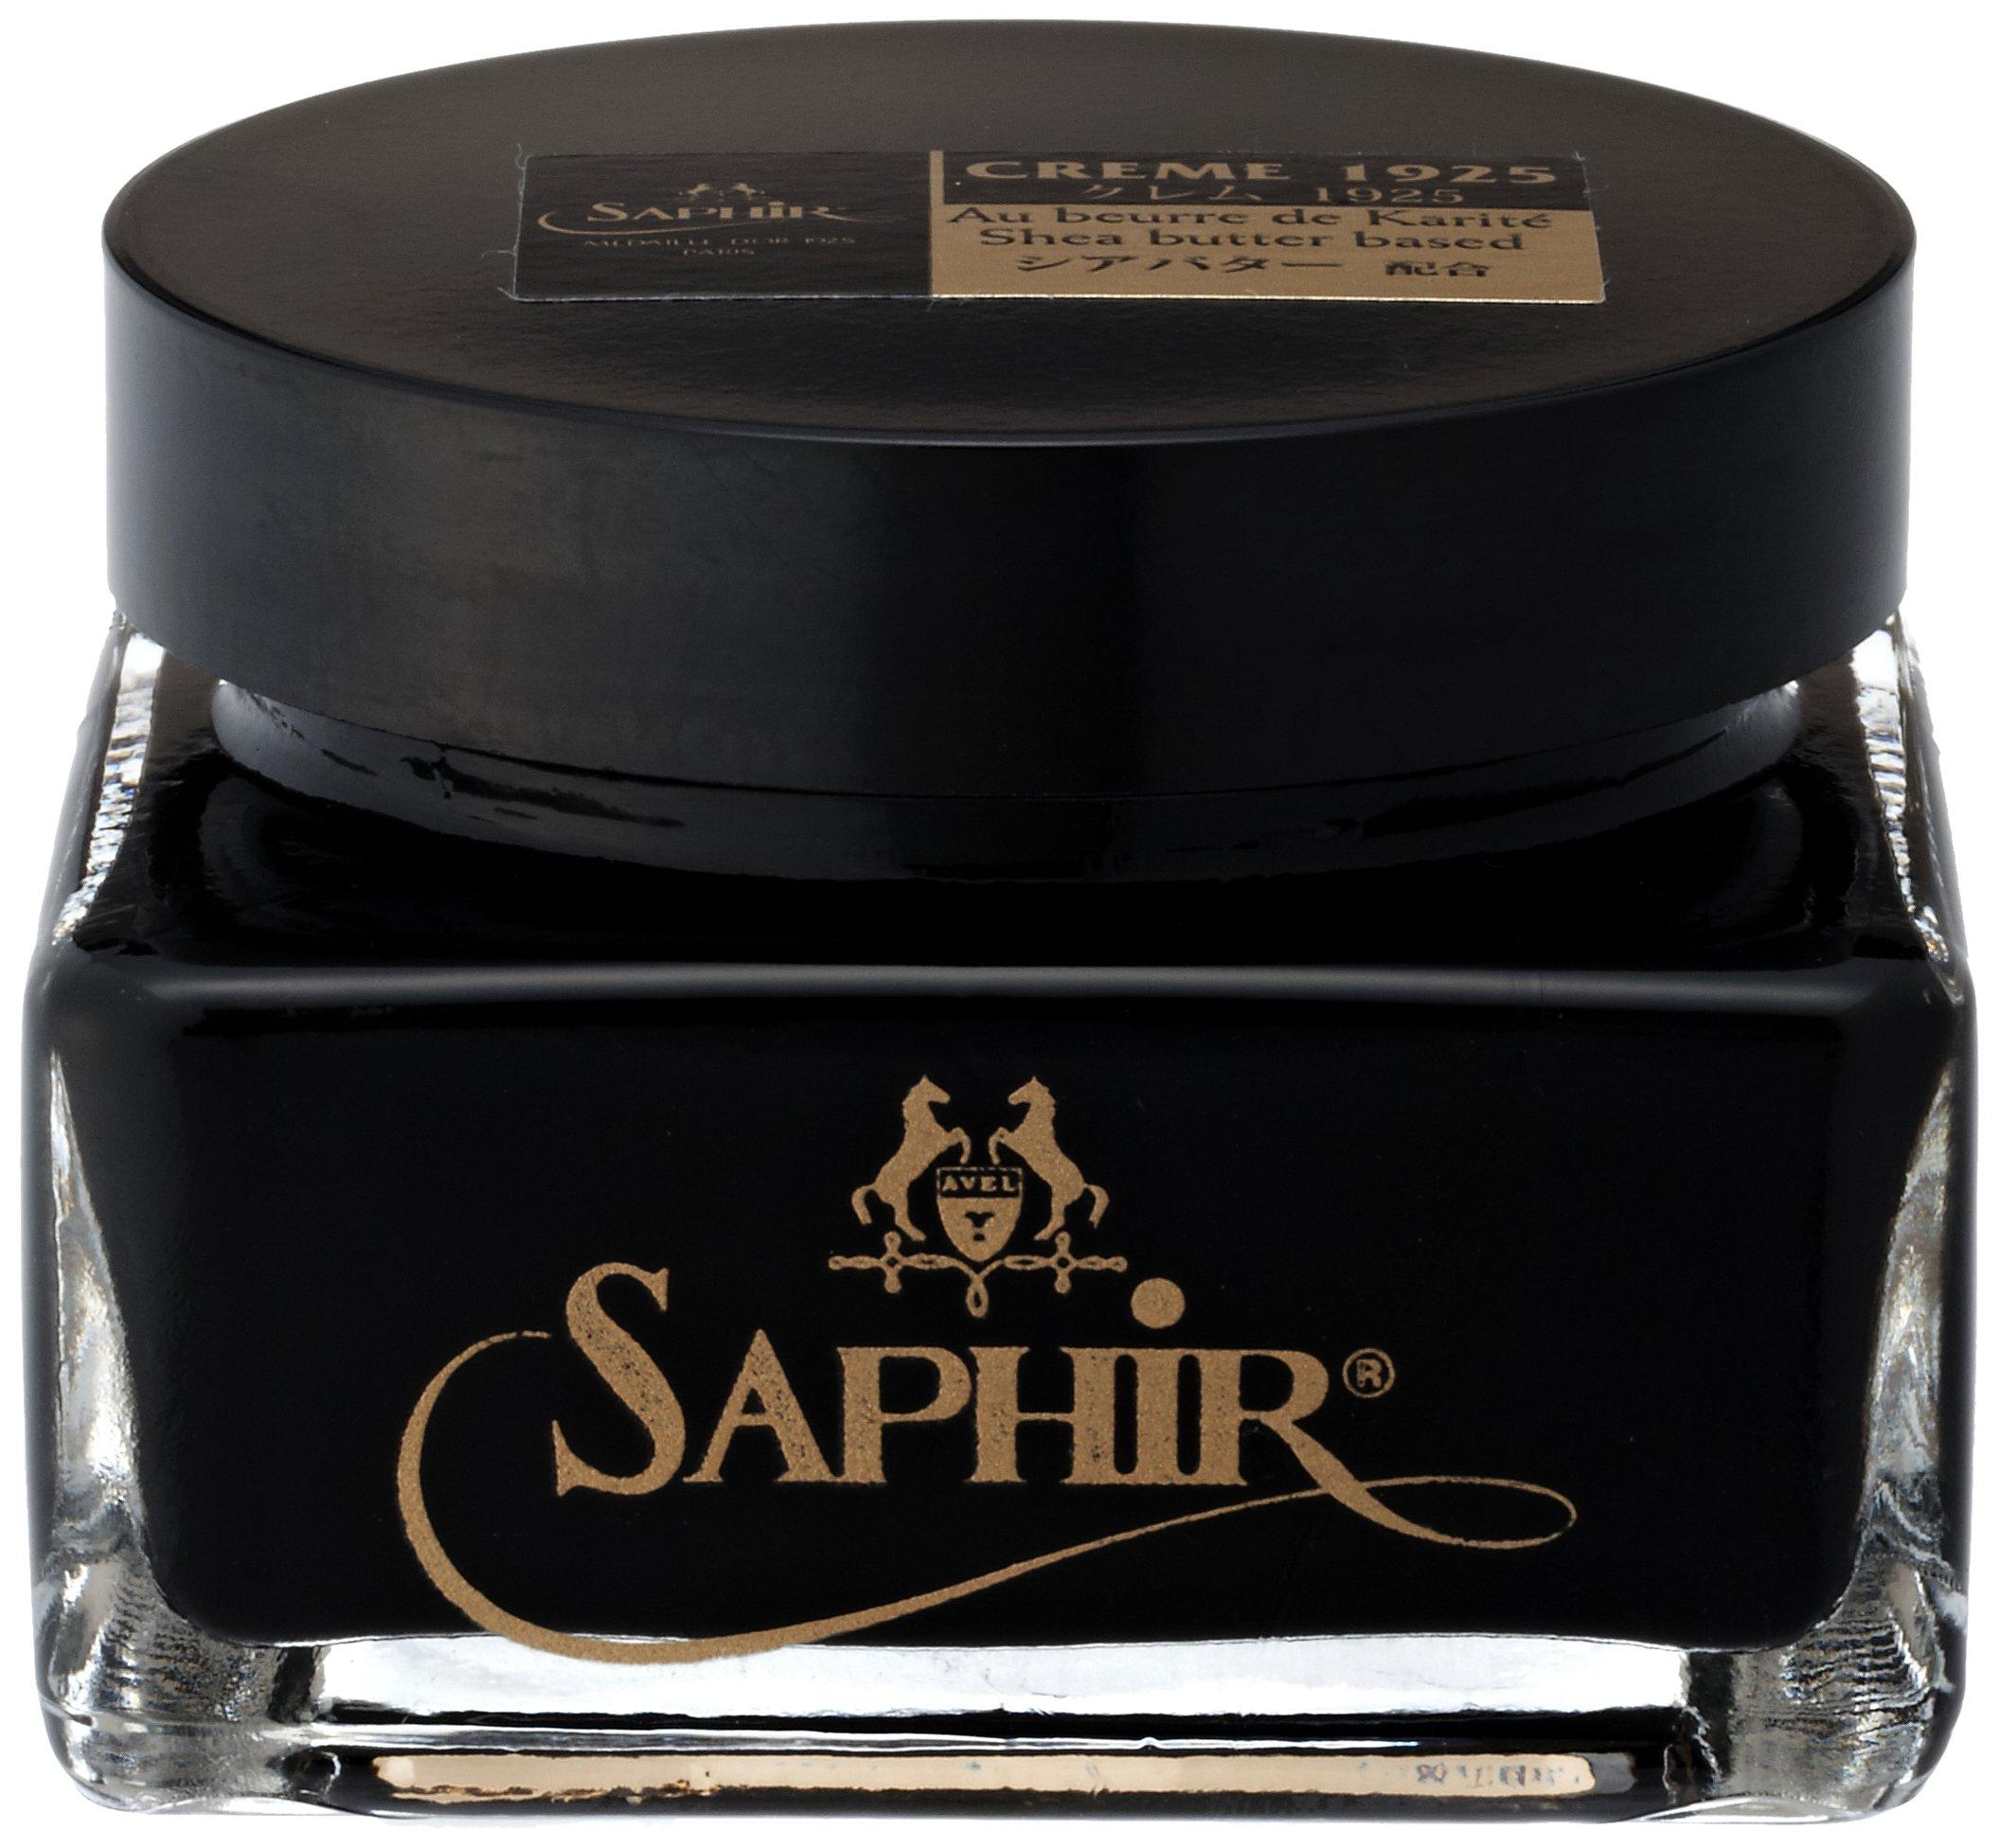 Saphir Pommadier Cream Shoe Polish - Black #01